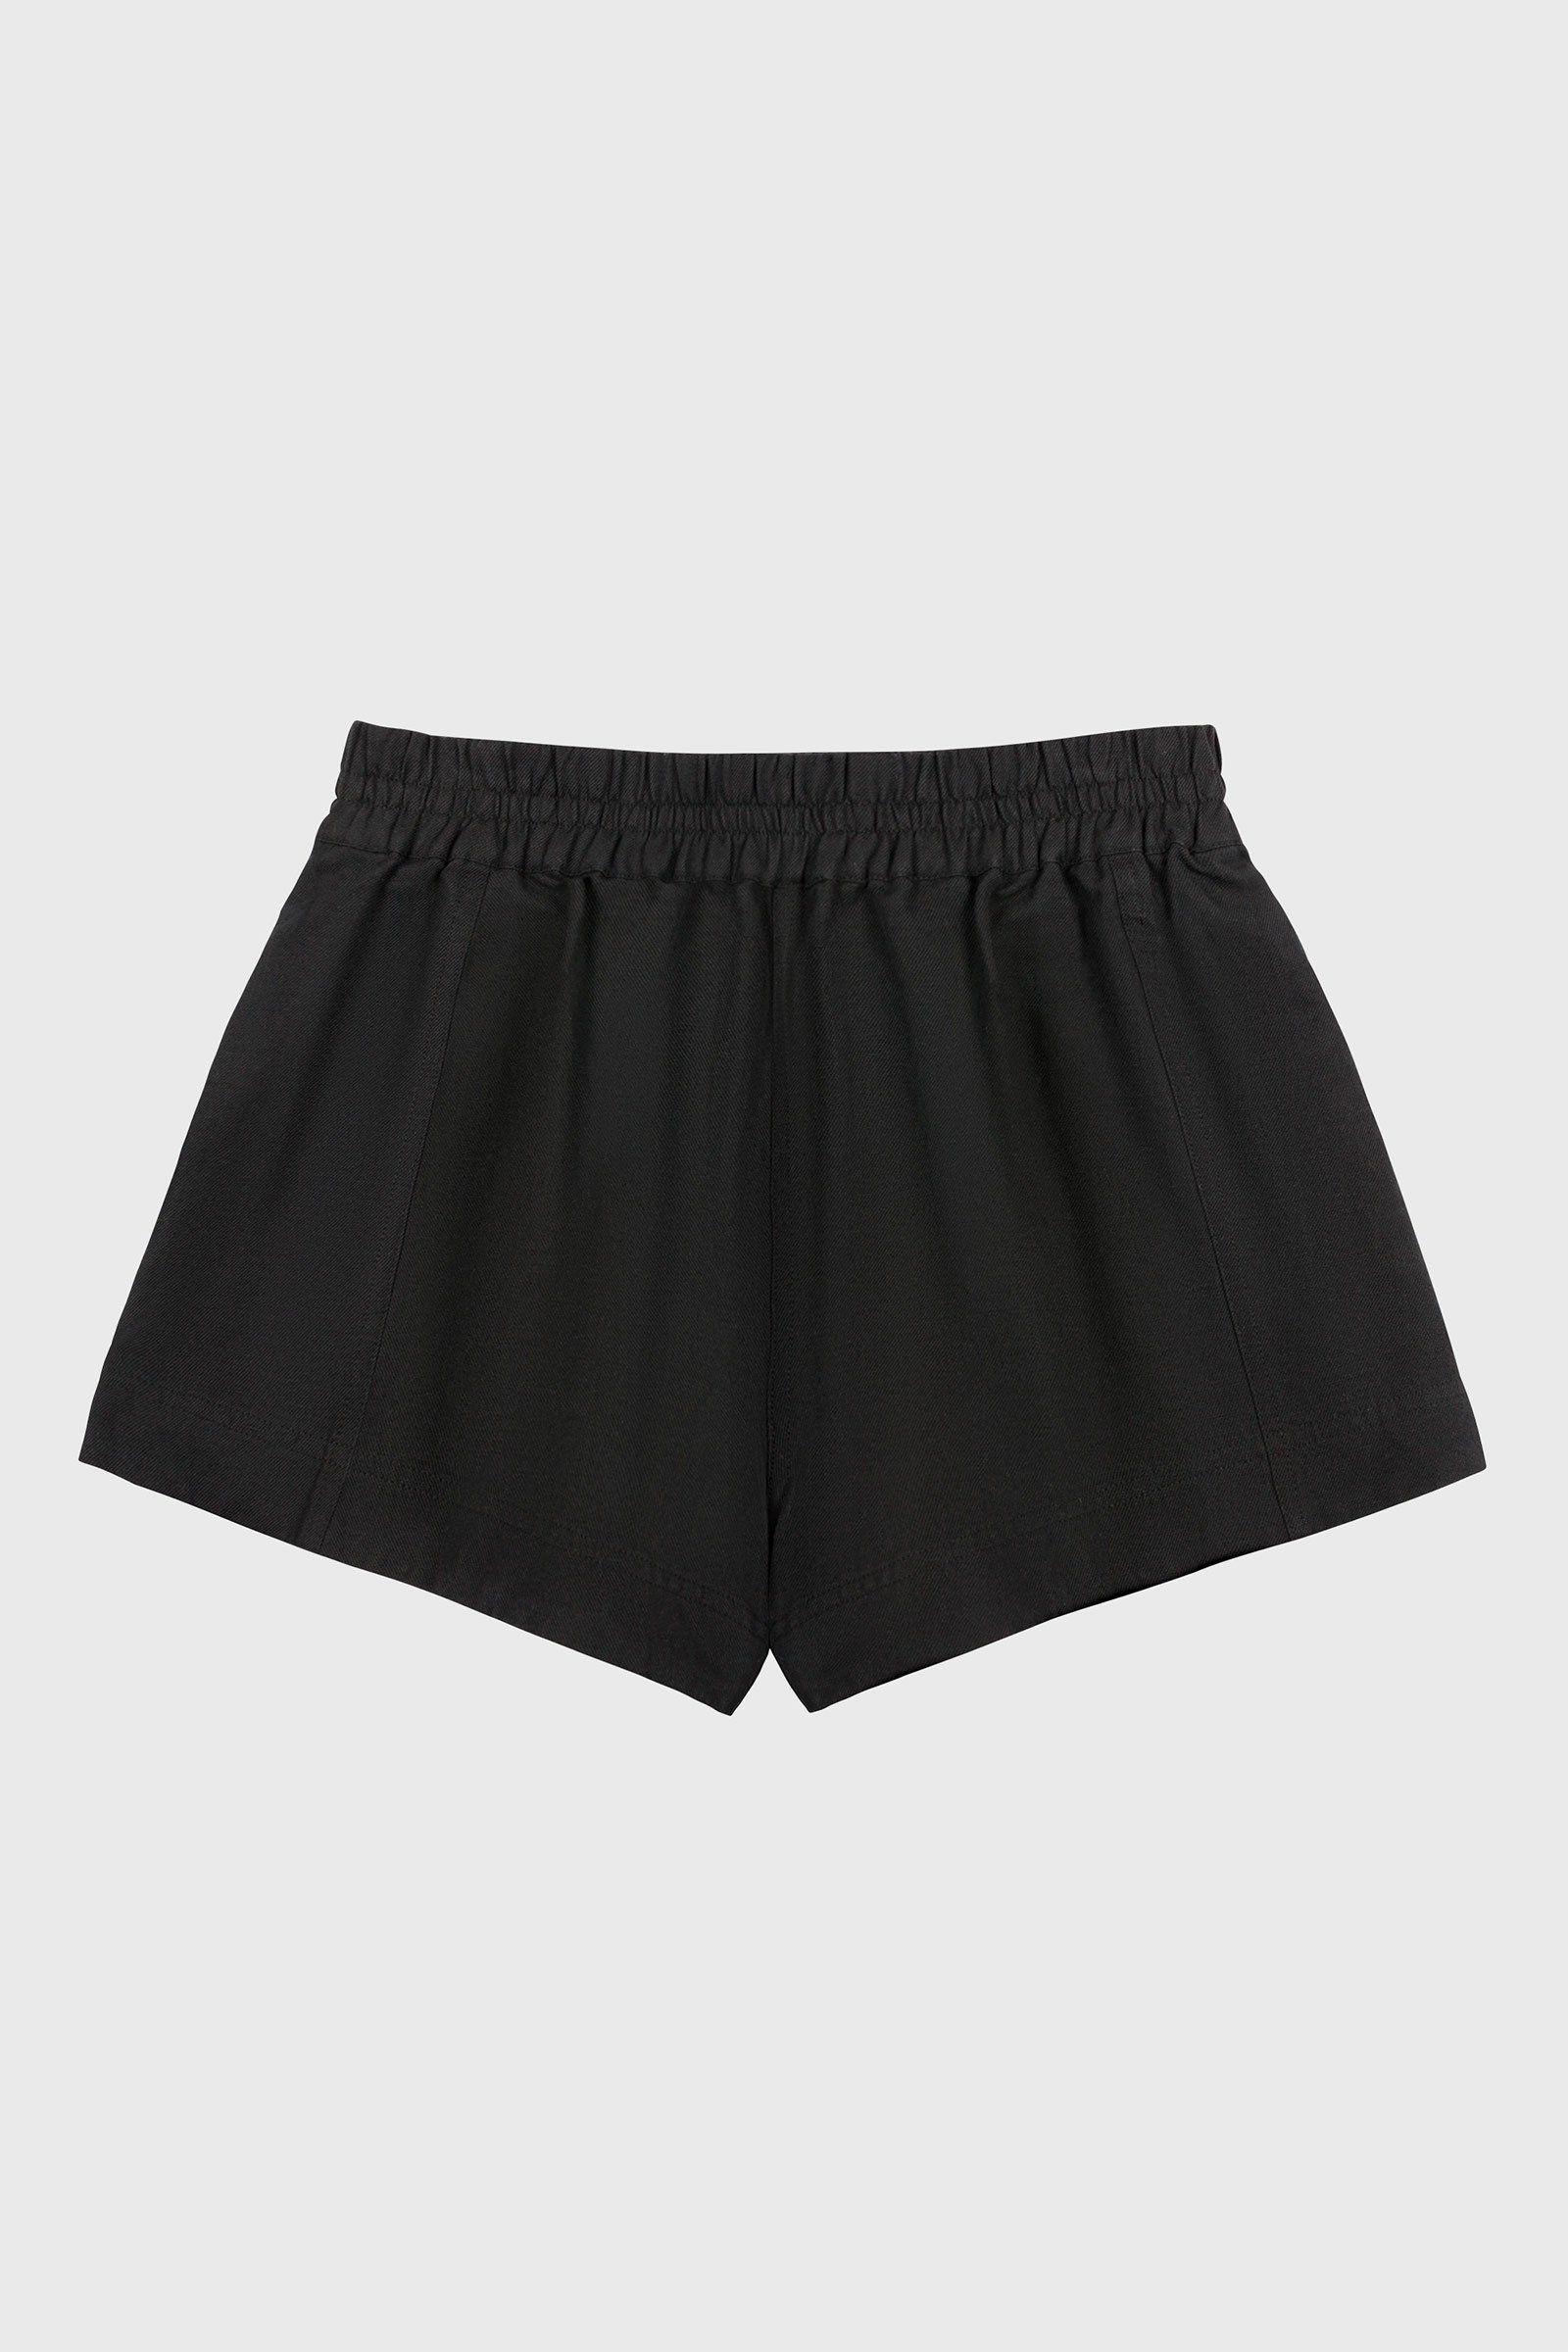 Denys Runner Short Apiece Apart Fashion Short Dresses Short [ 2400 x 1600 Pixel ]